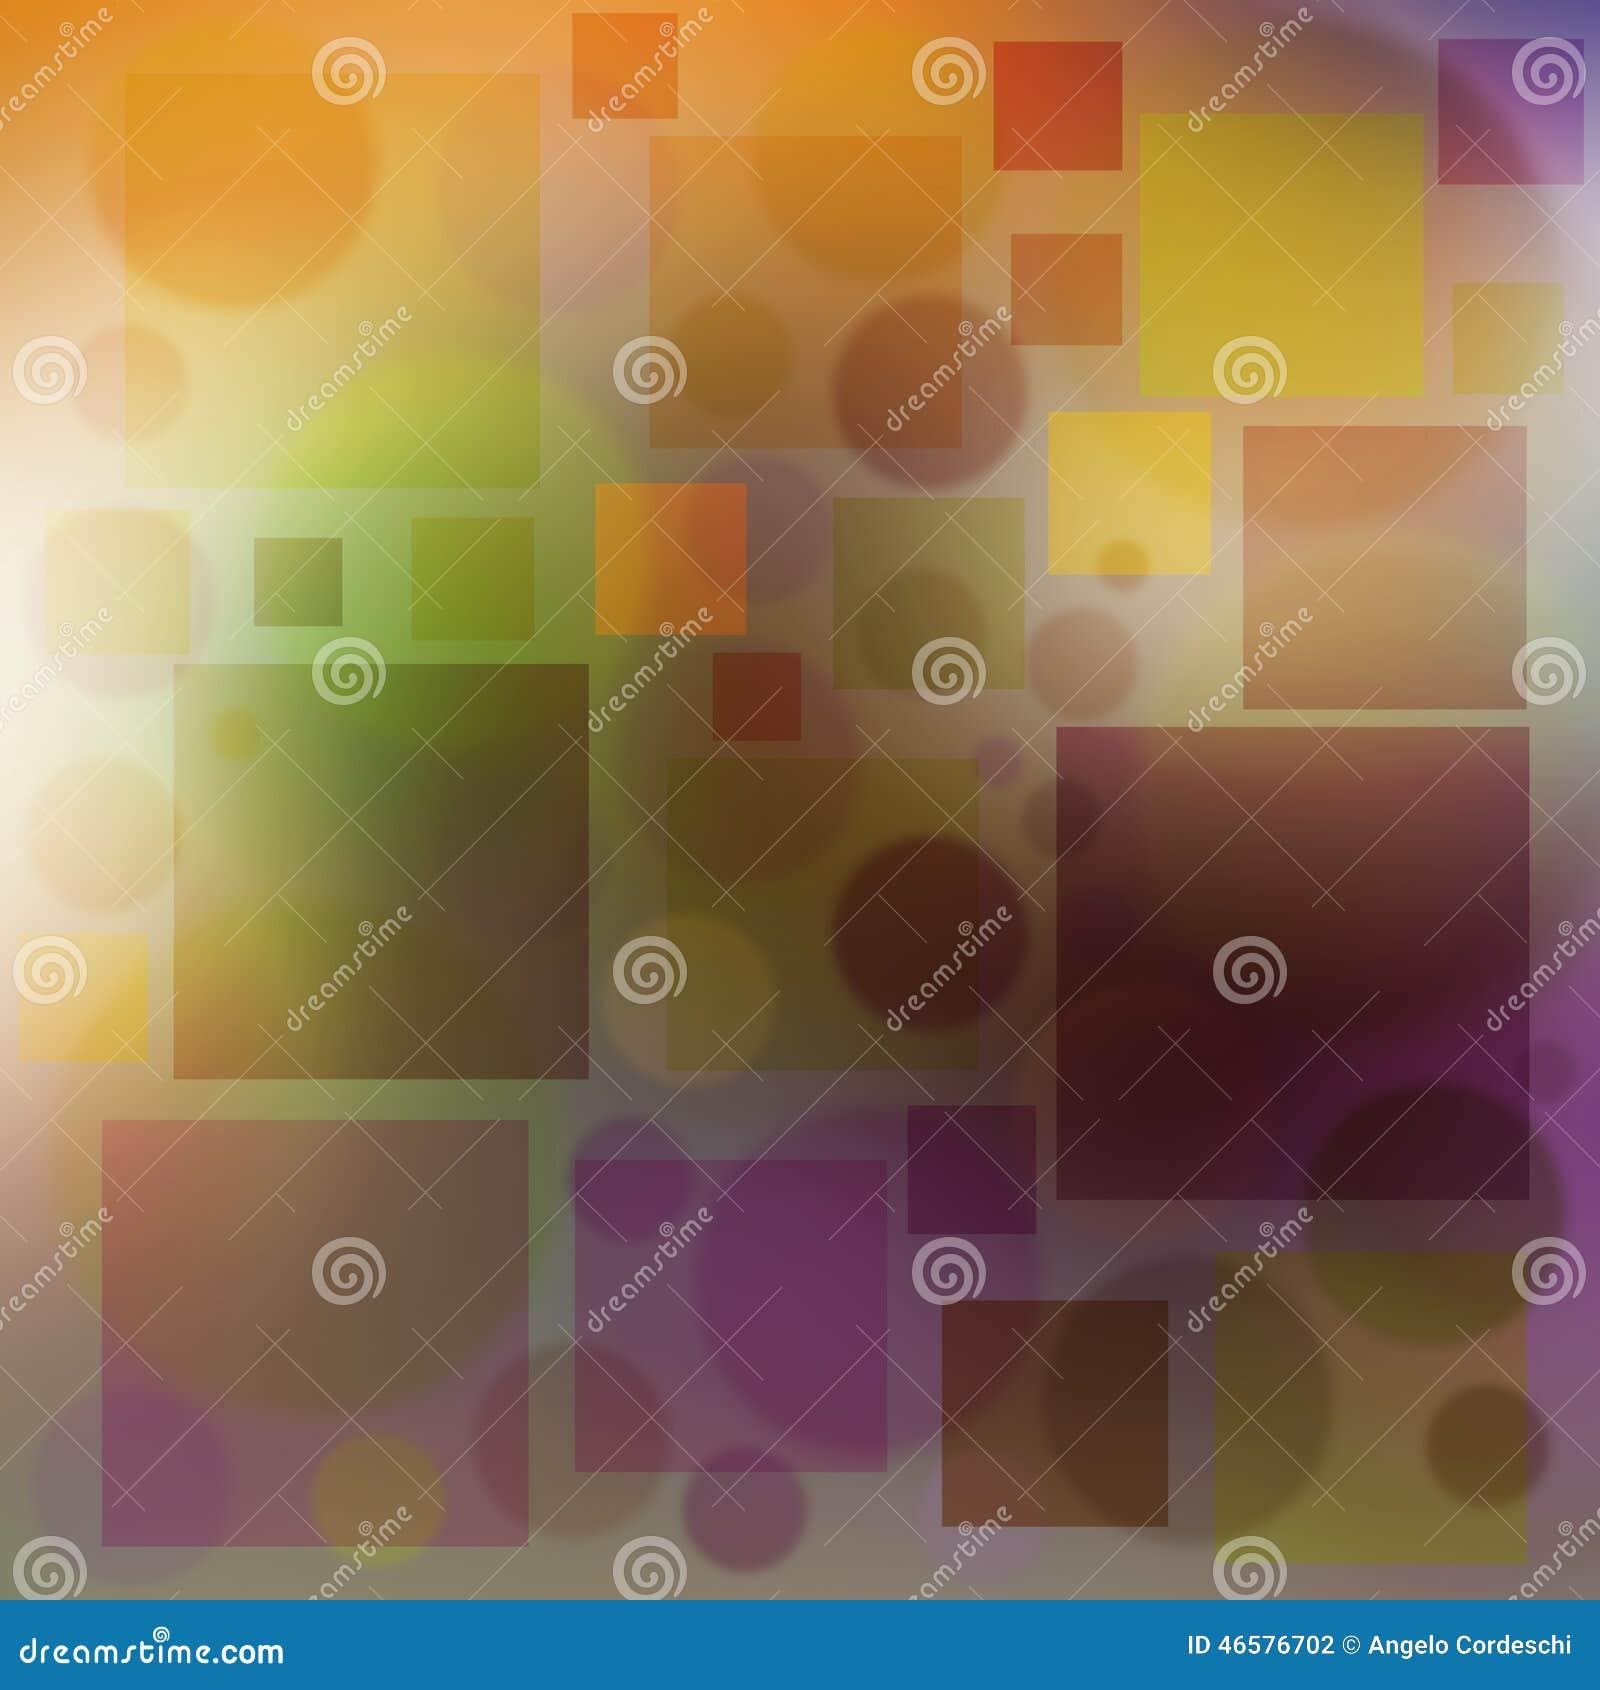 Multicolored Background Bubbles Circles And Square Soft